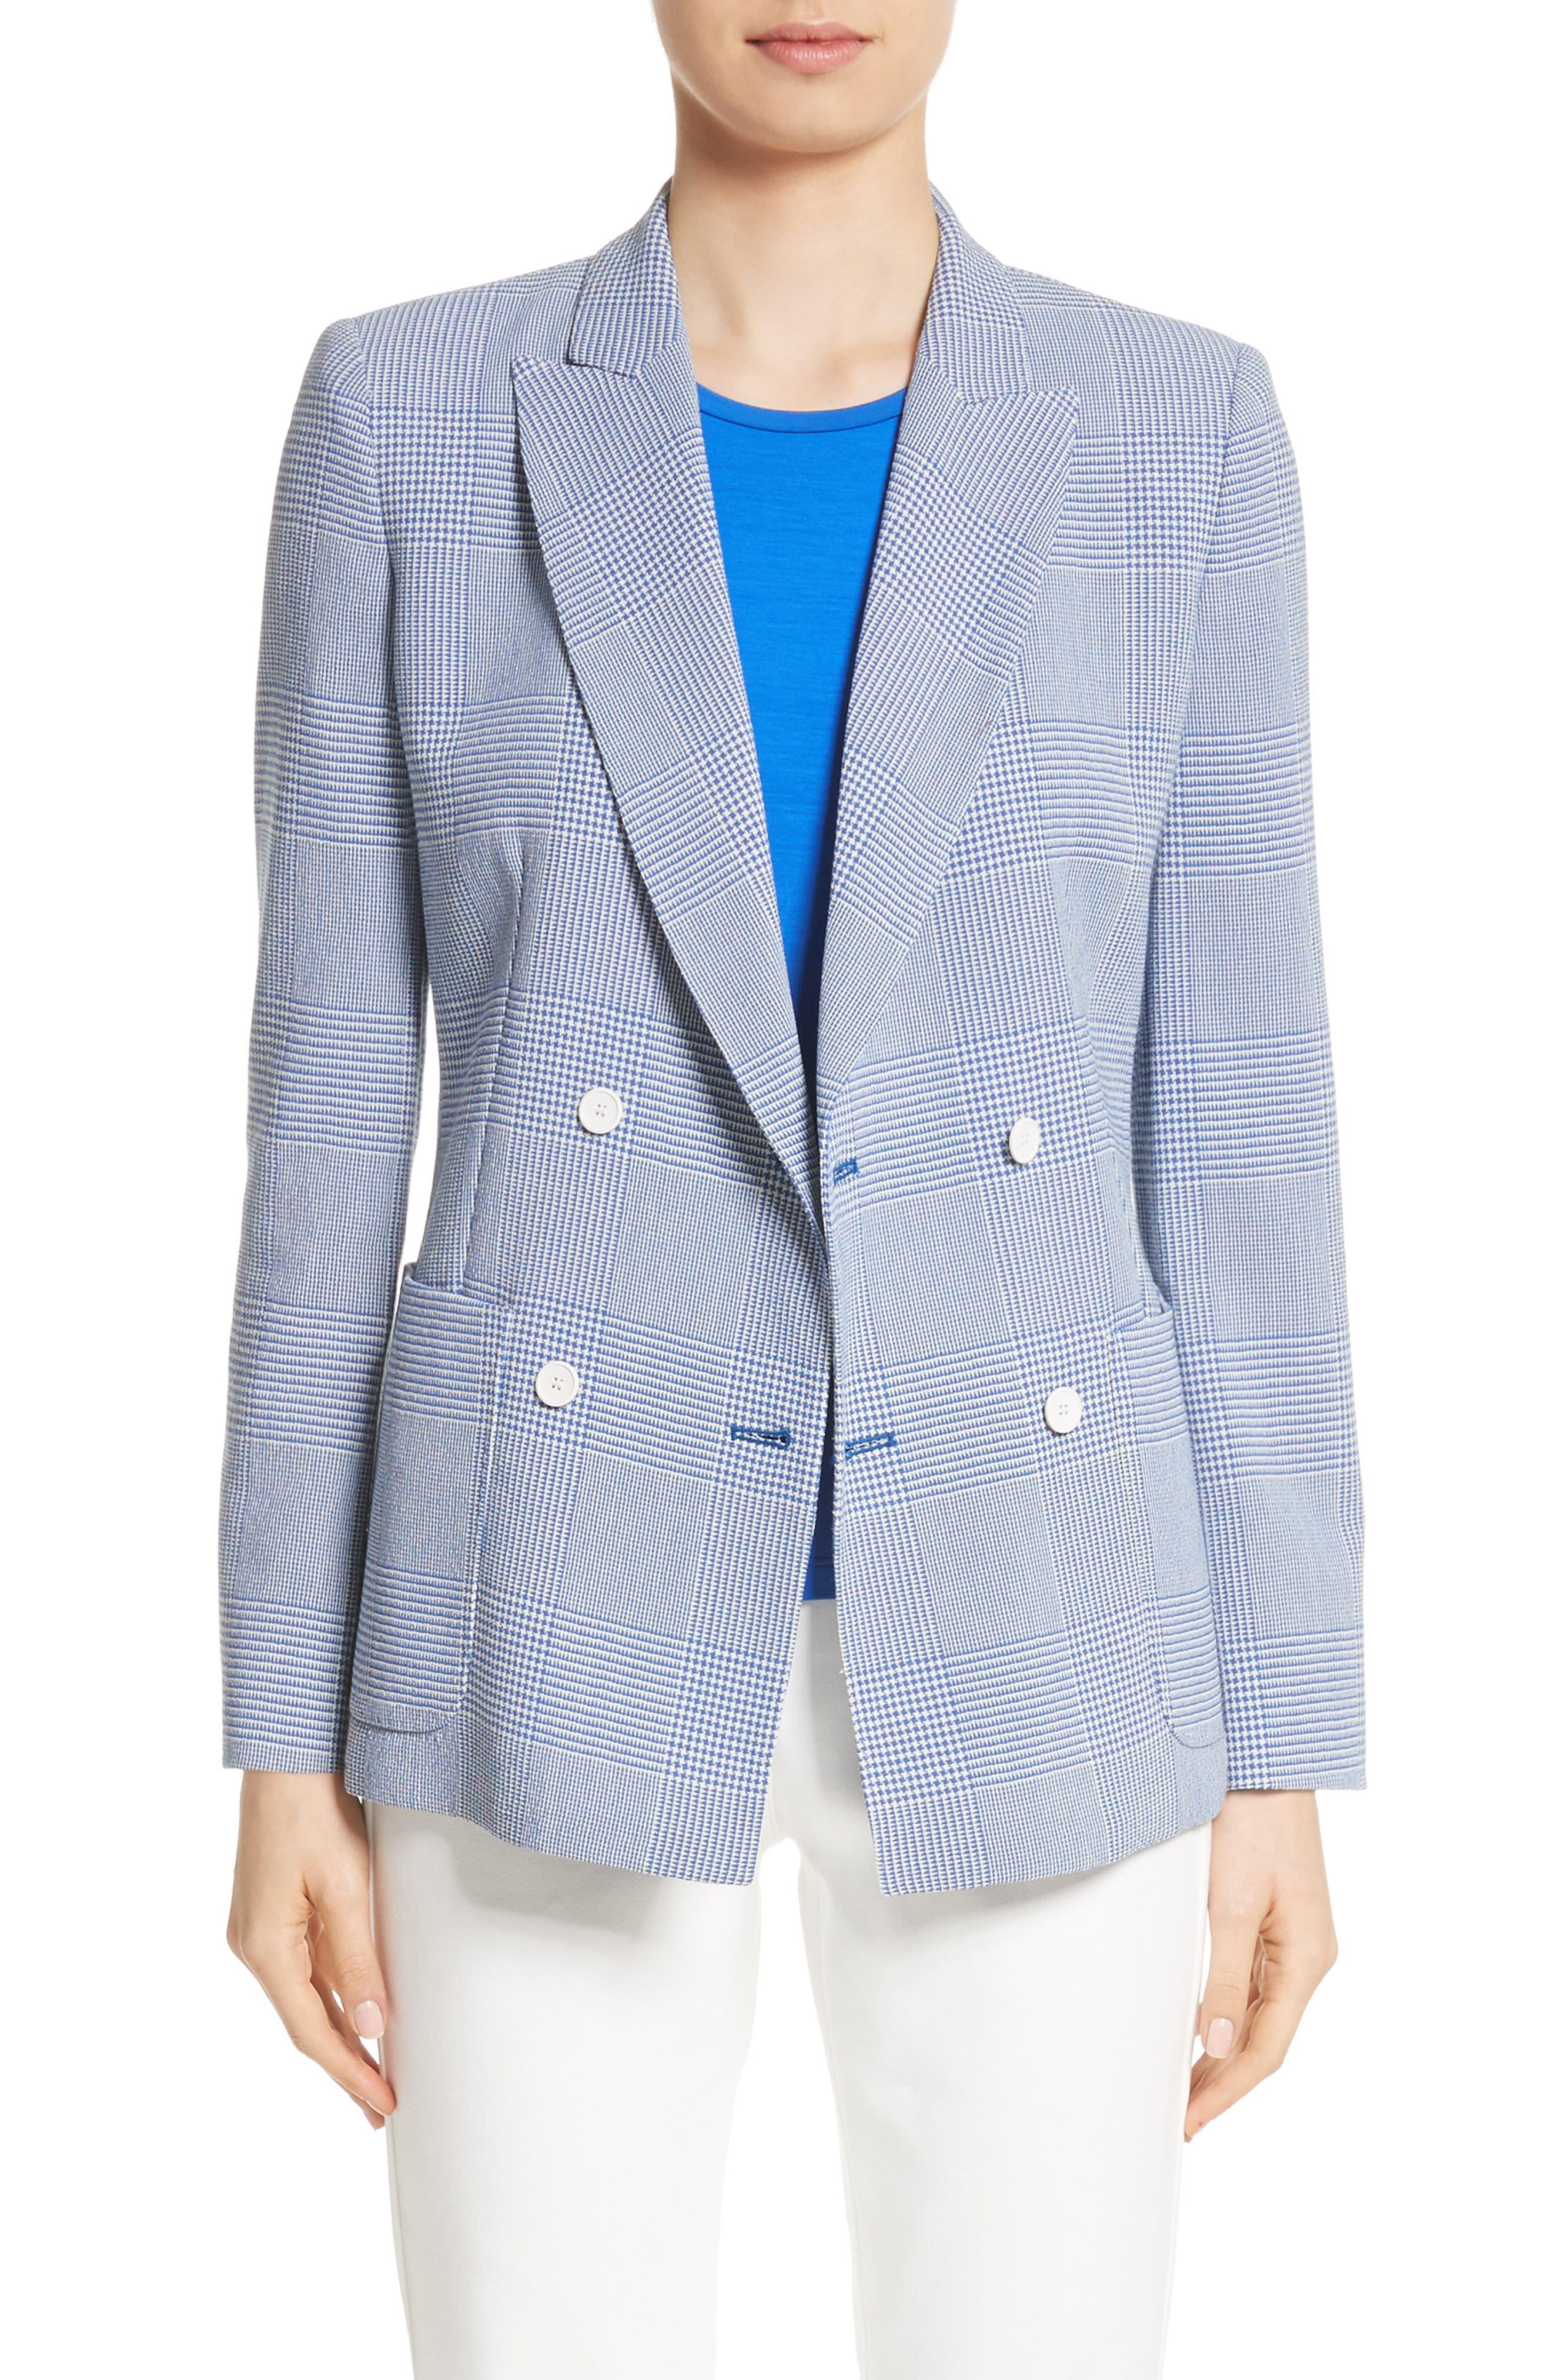 Max Mara Ballata Check Wool Blazer